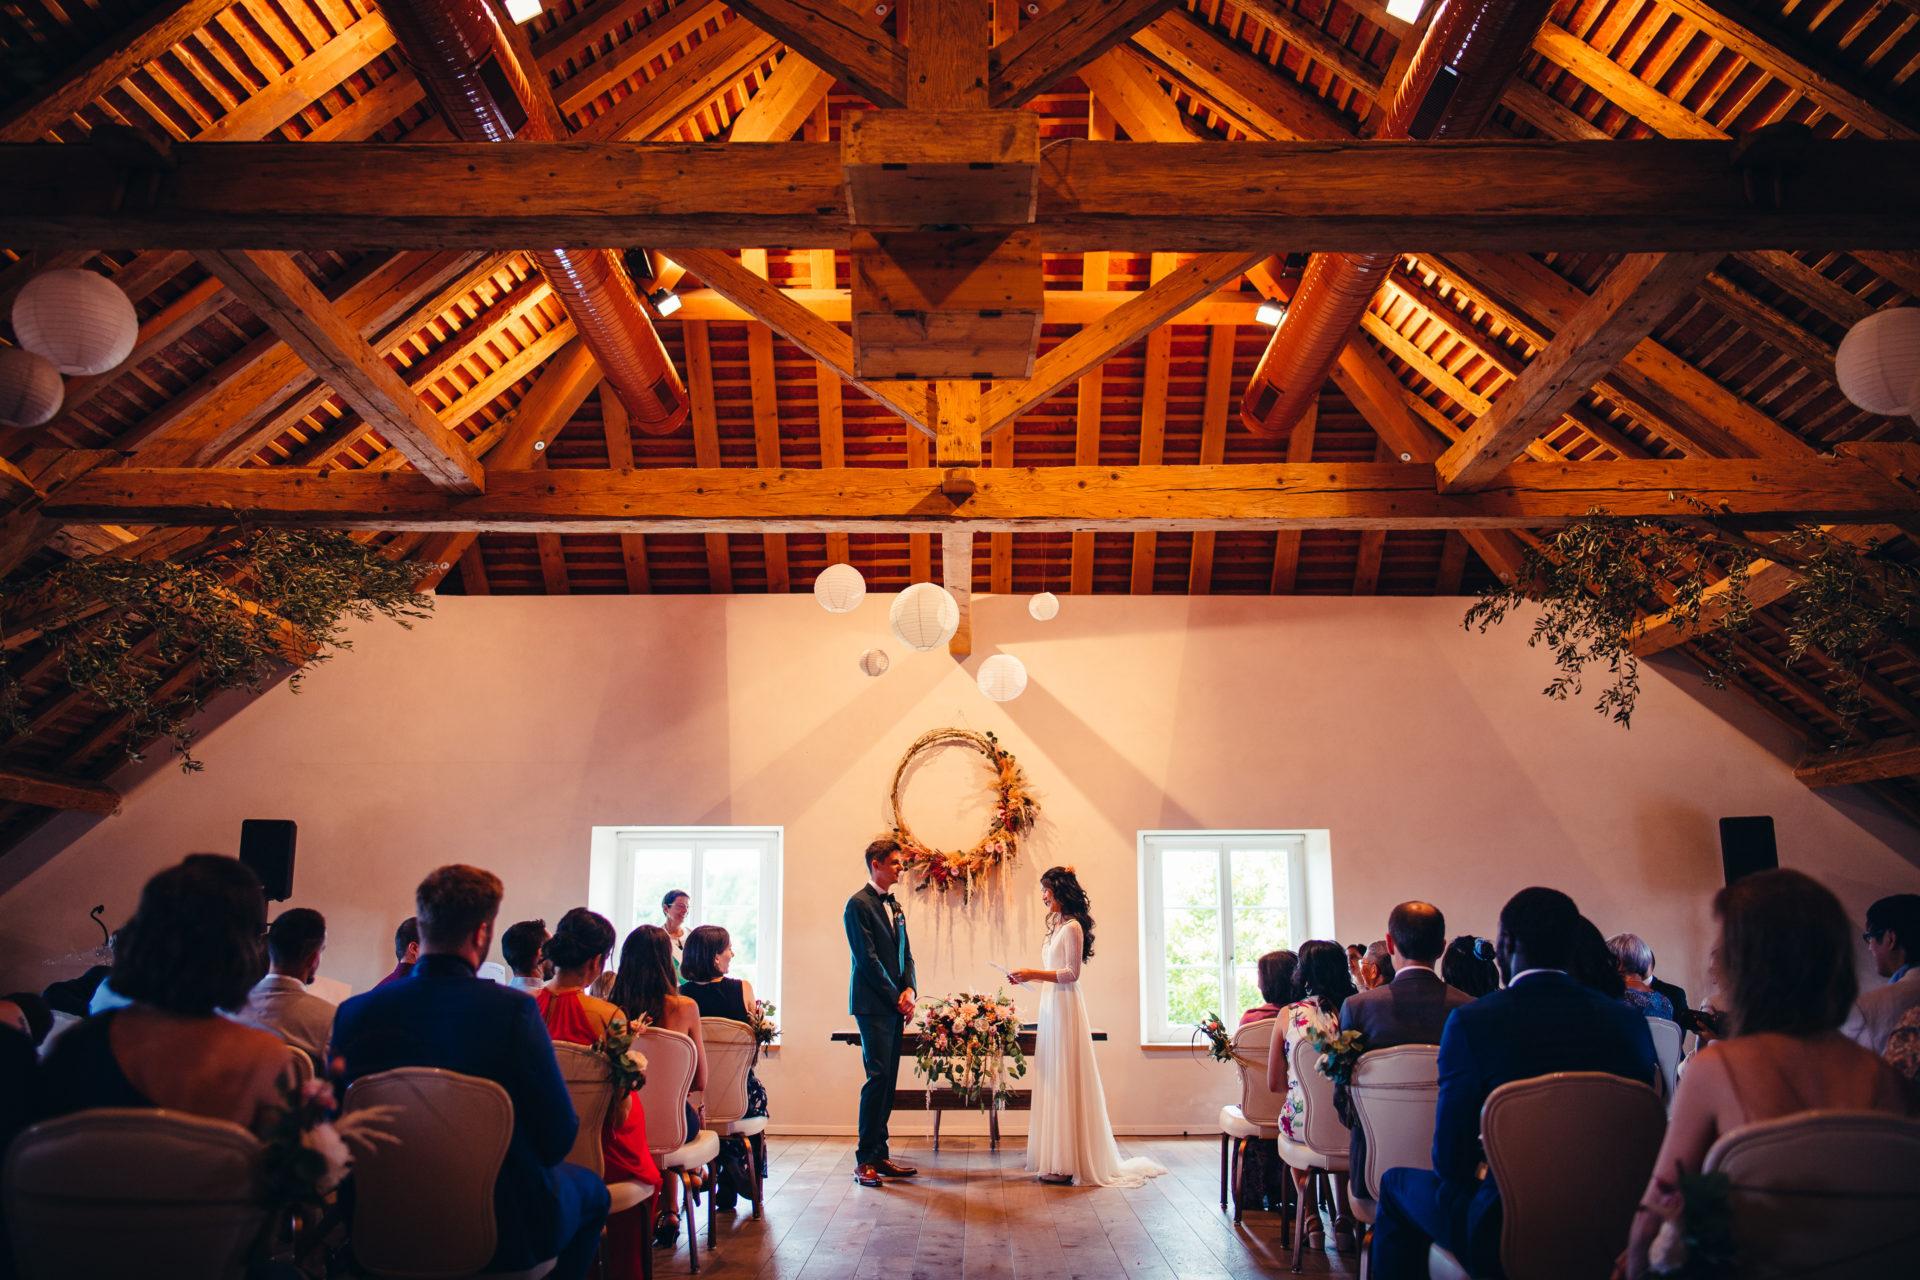 FELIX13 JD HD 110720 438 scaled - Quelle cérémonie choisir pour son mariage?